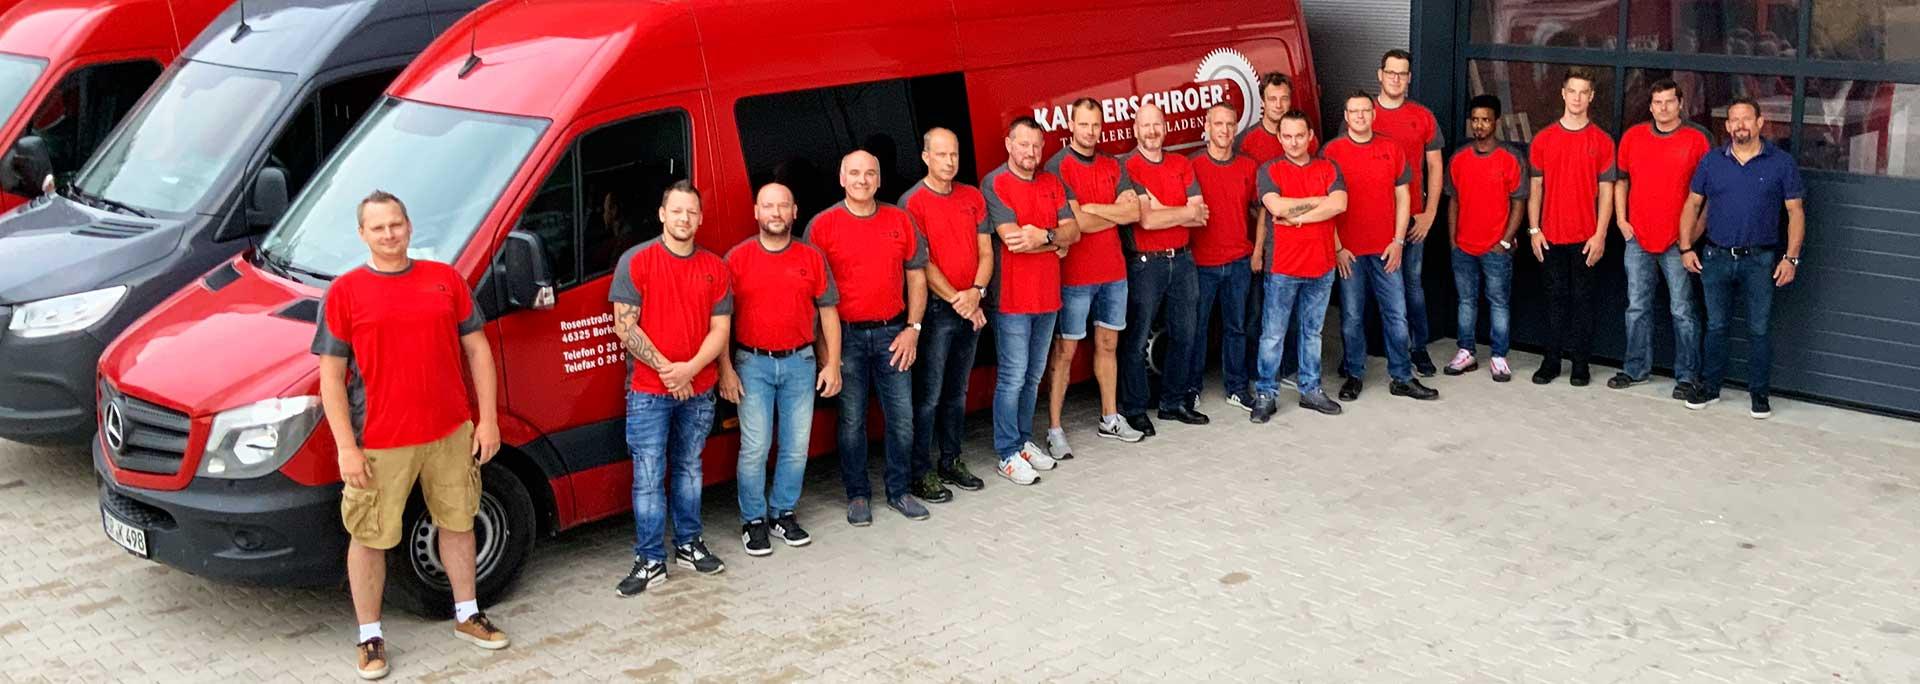 Team Tischlerei